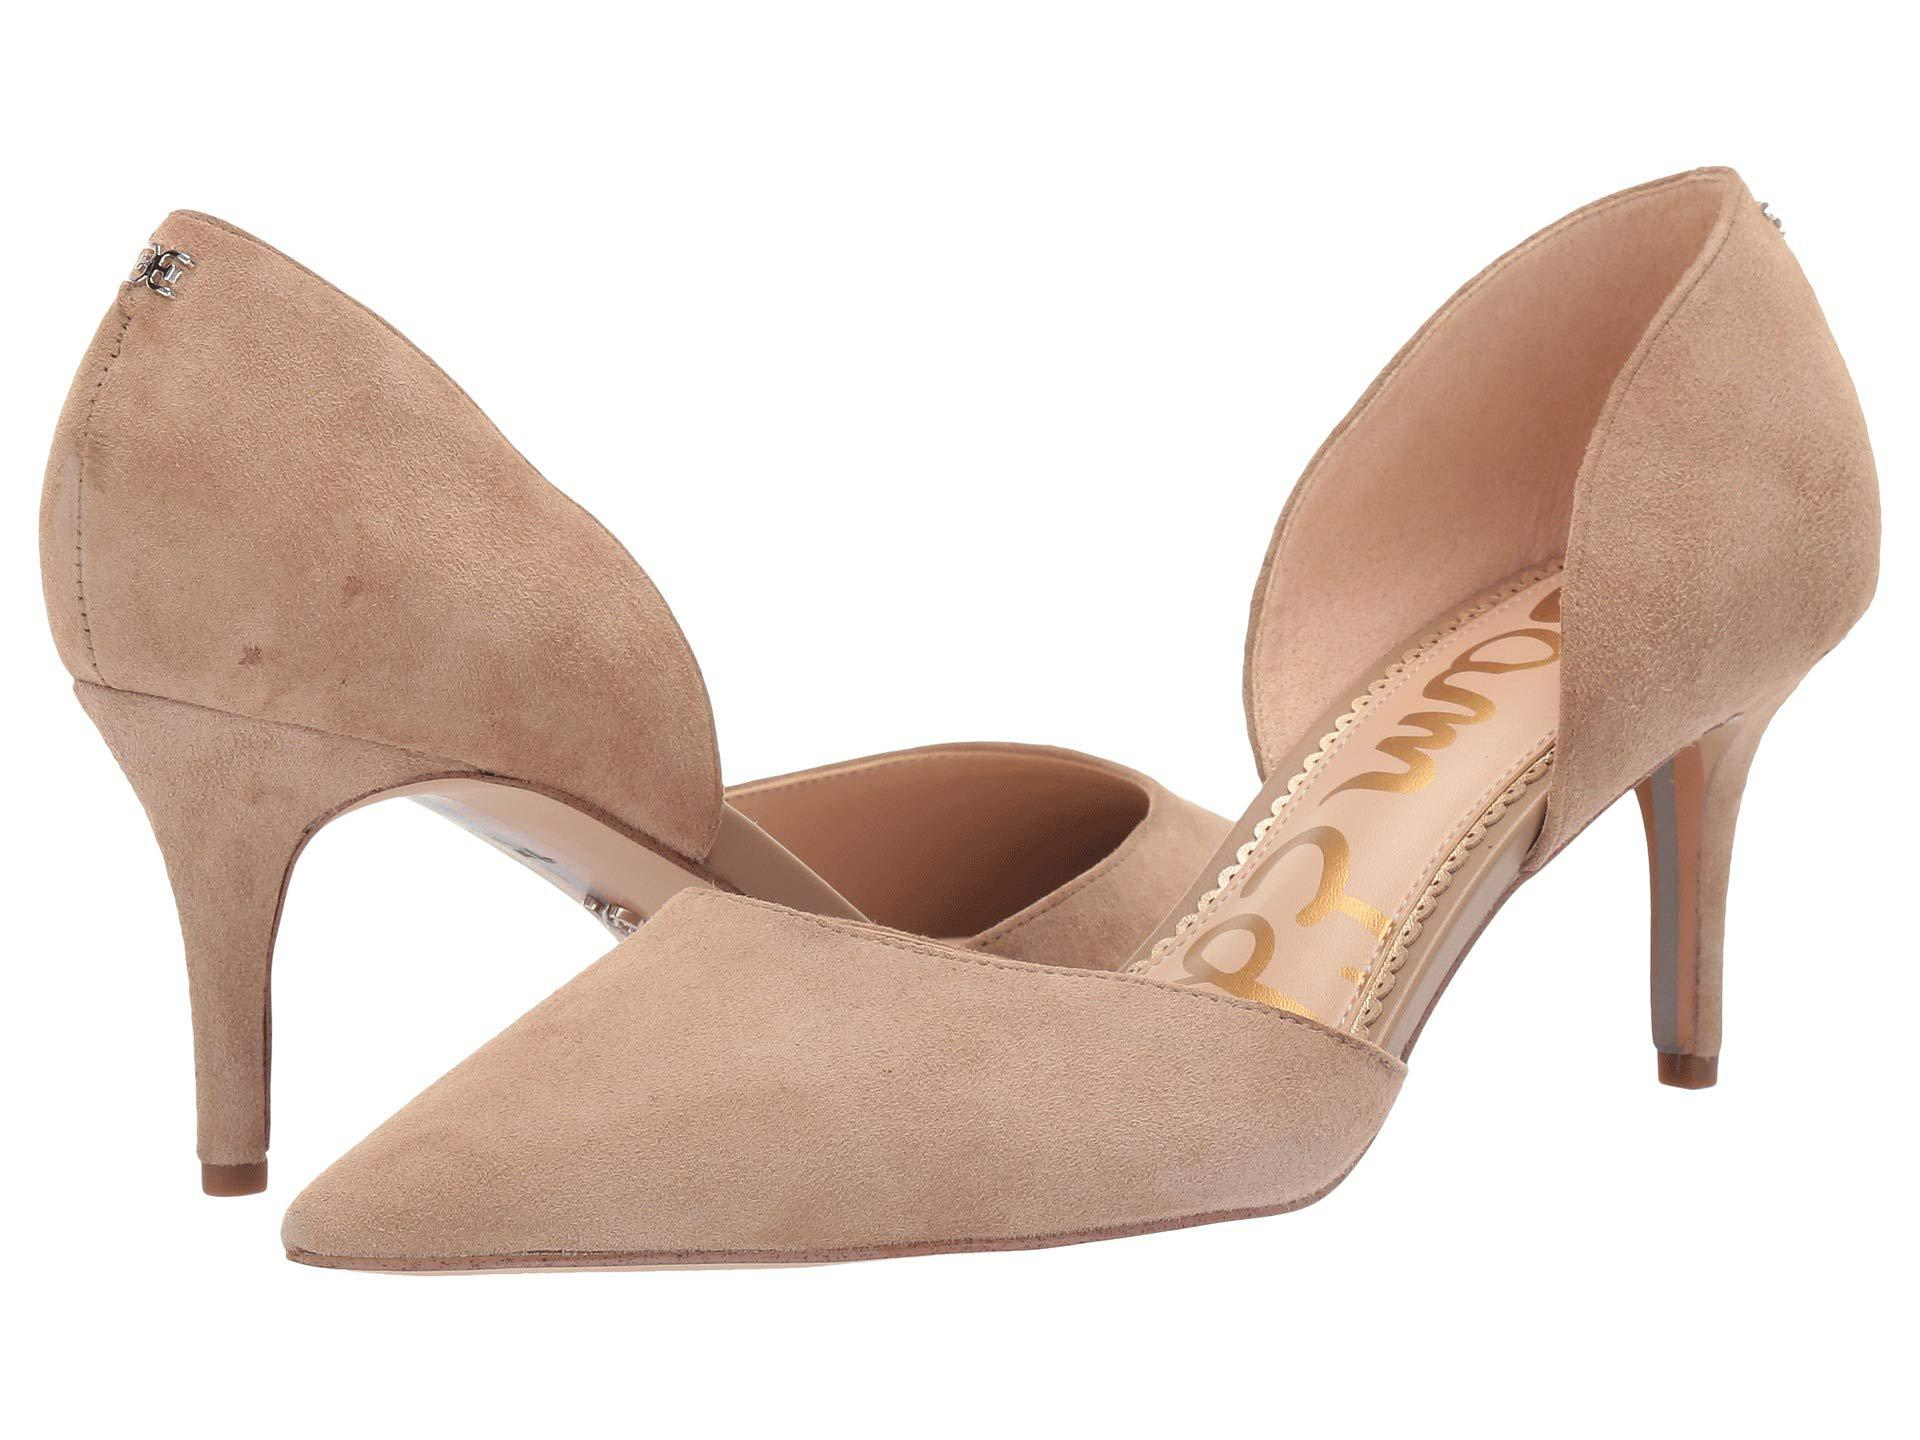 dd9855f645e62 Lyst - Sam Edelman Jaina (black Kid Suede Leather) Women s Shoes in ...